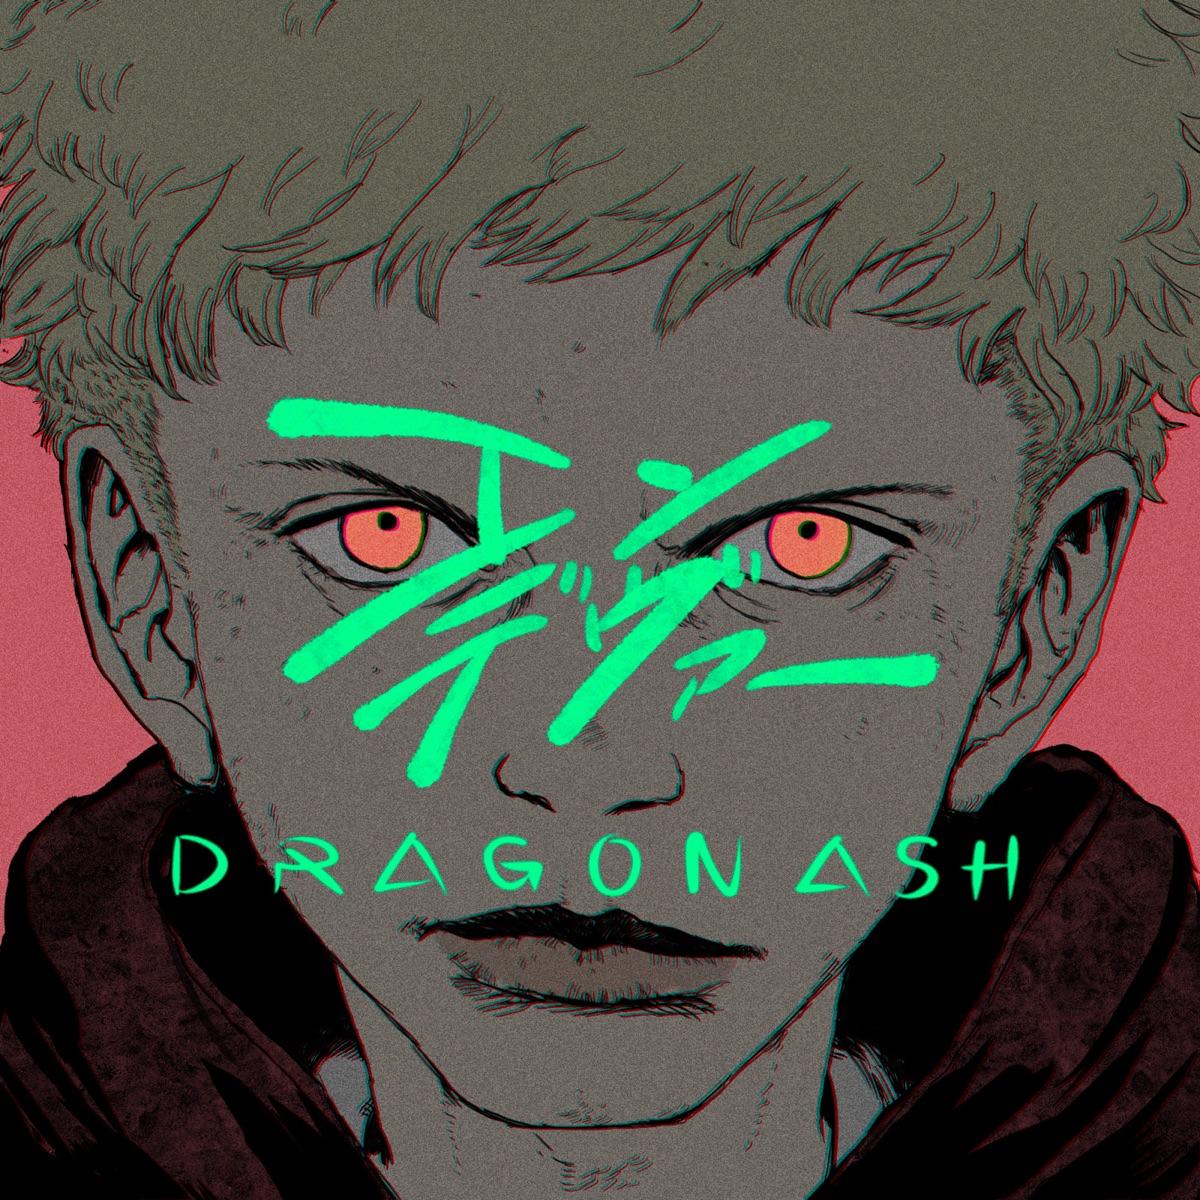 『Dragon Ash - エンデヴァー』収録の『エンデヴァー』ジャケット